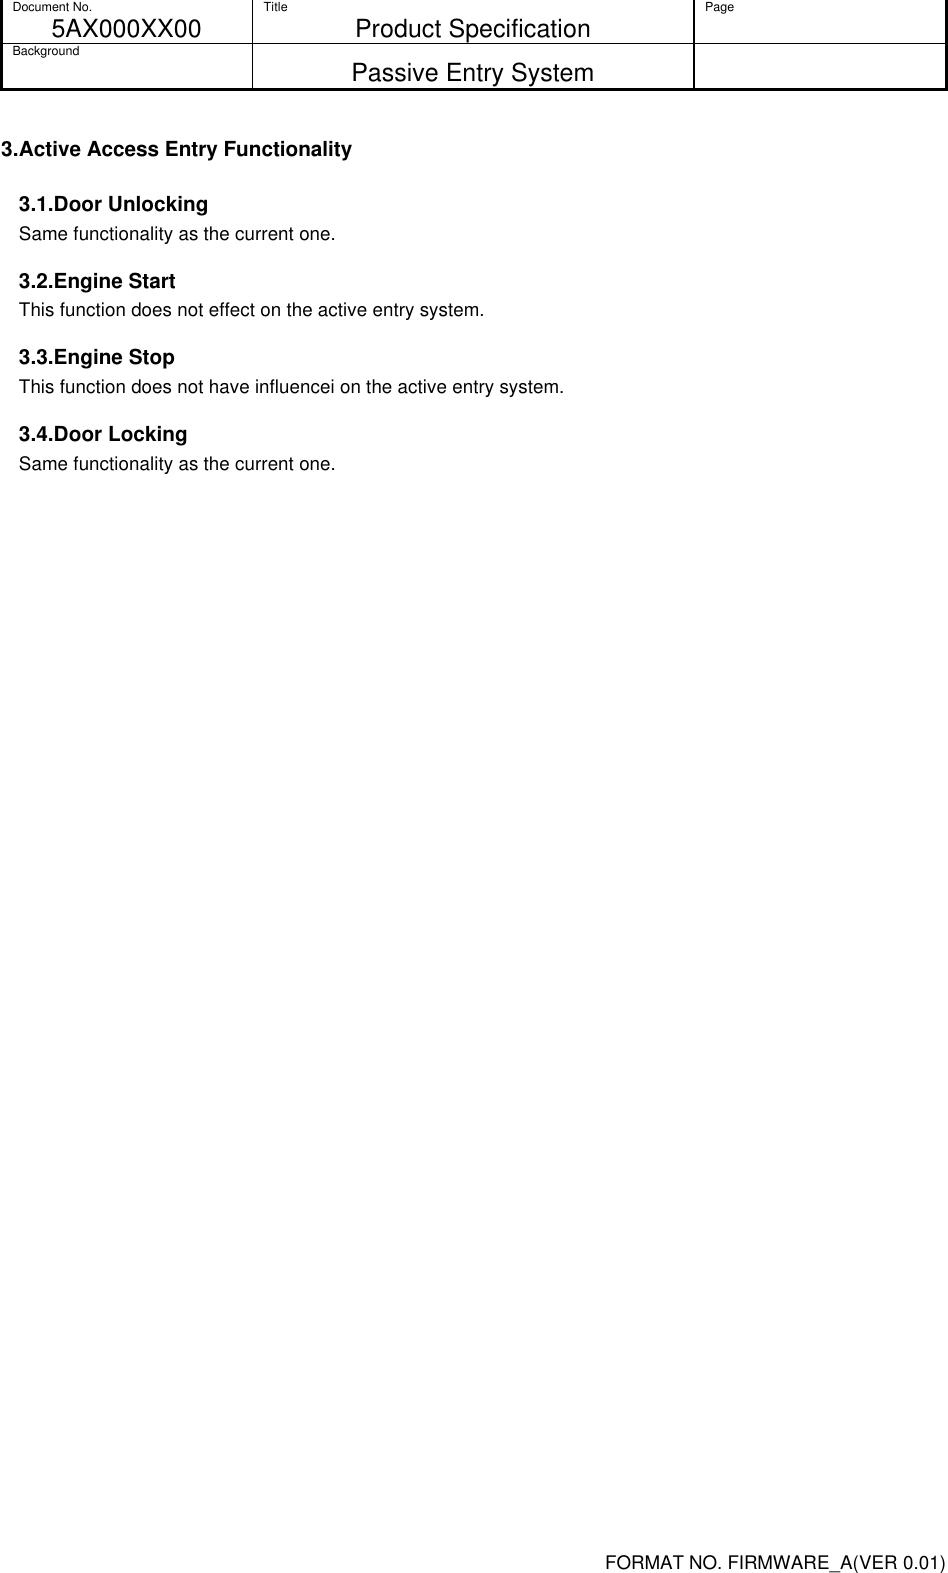 Tohoku Alps Co WDU61 Passive Entry System User Manual Infomation